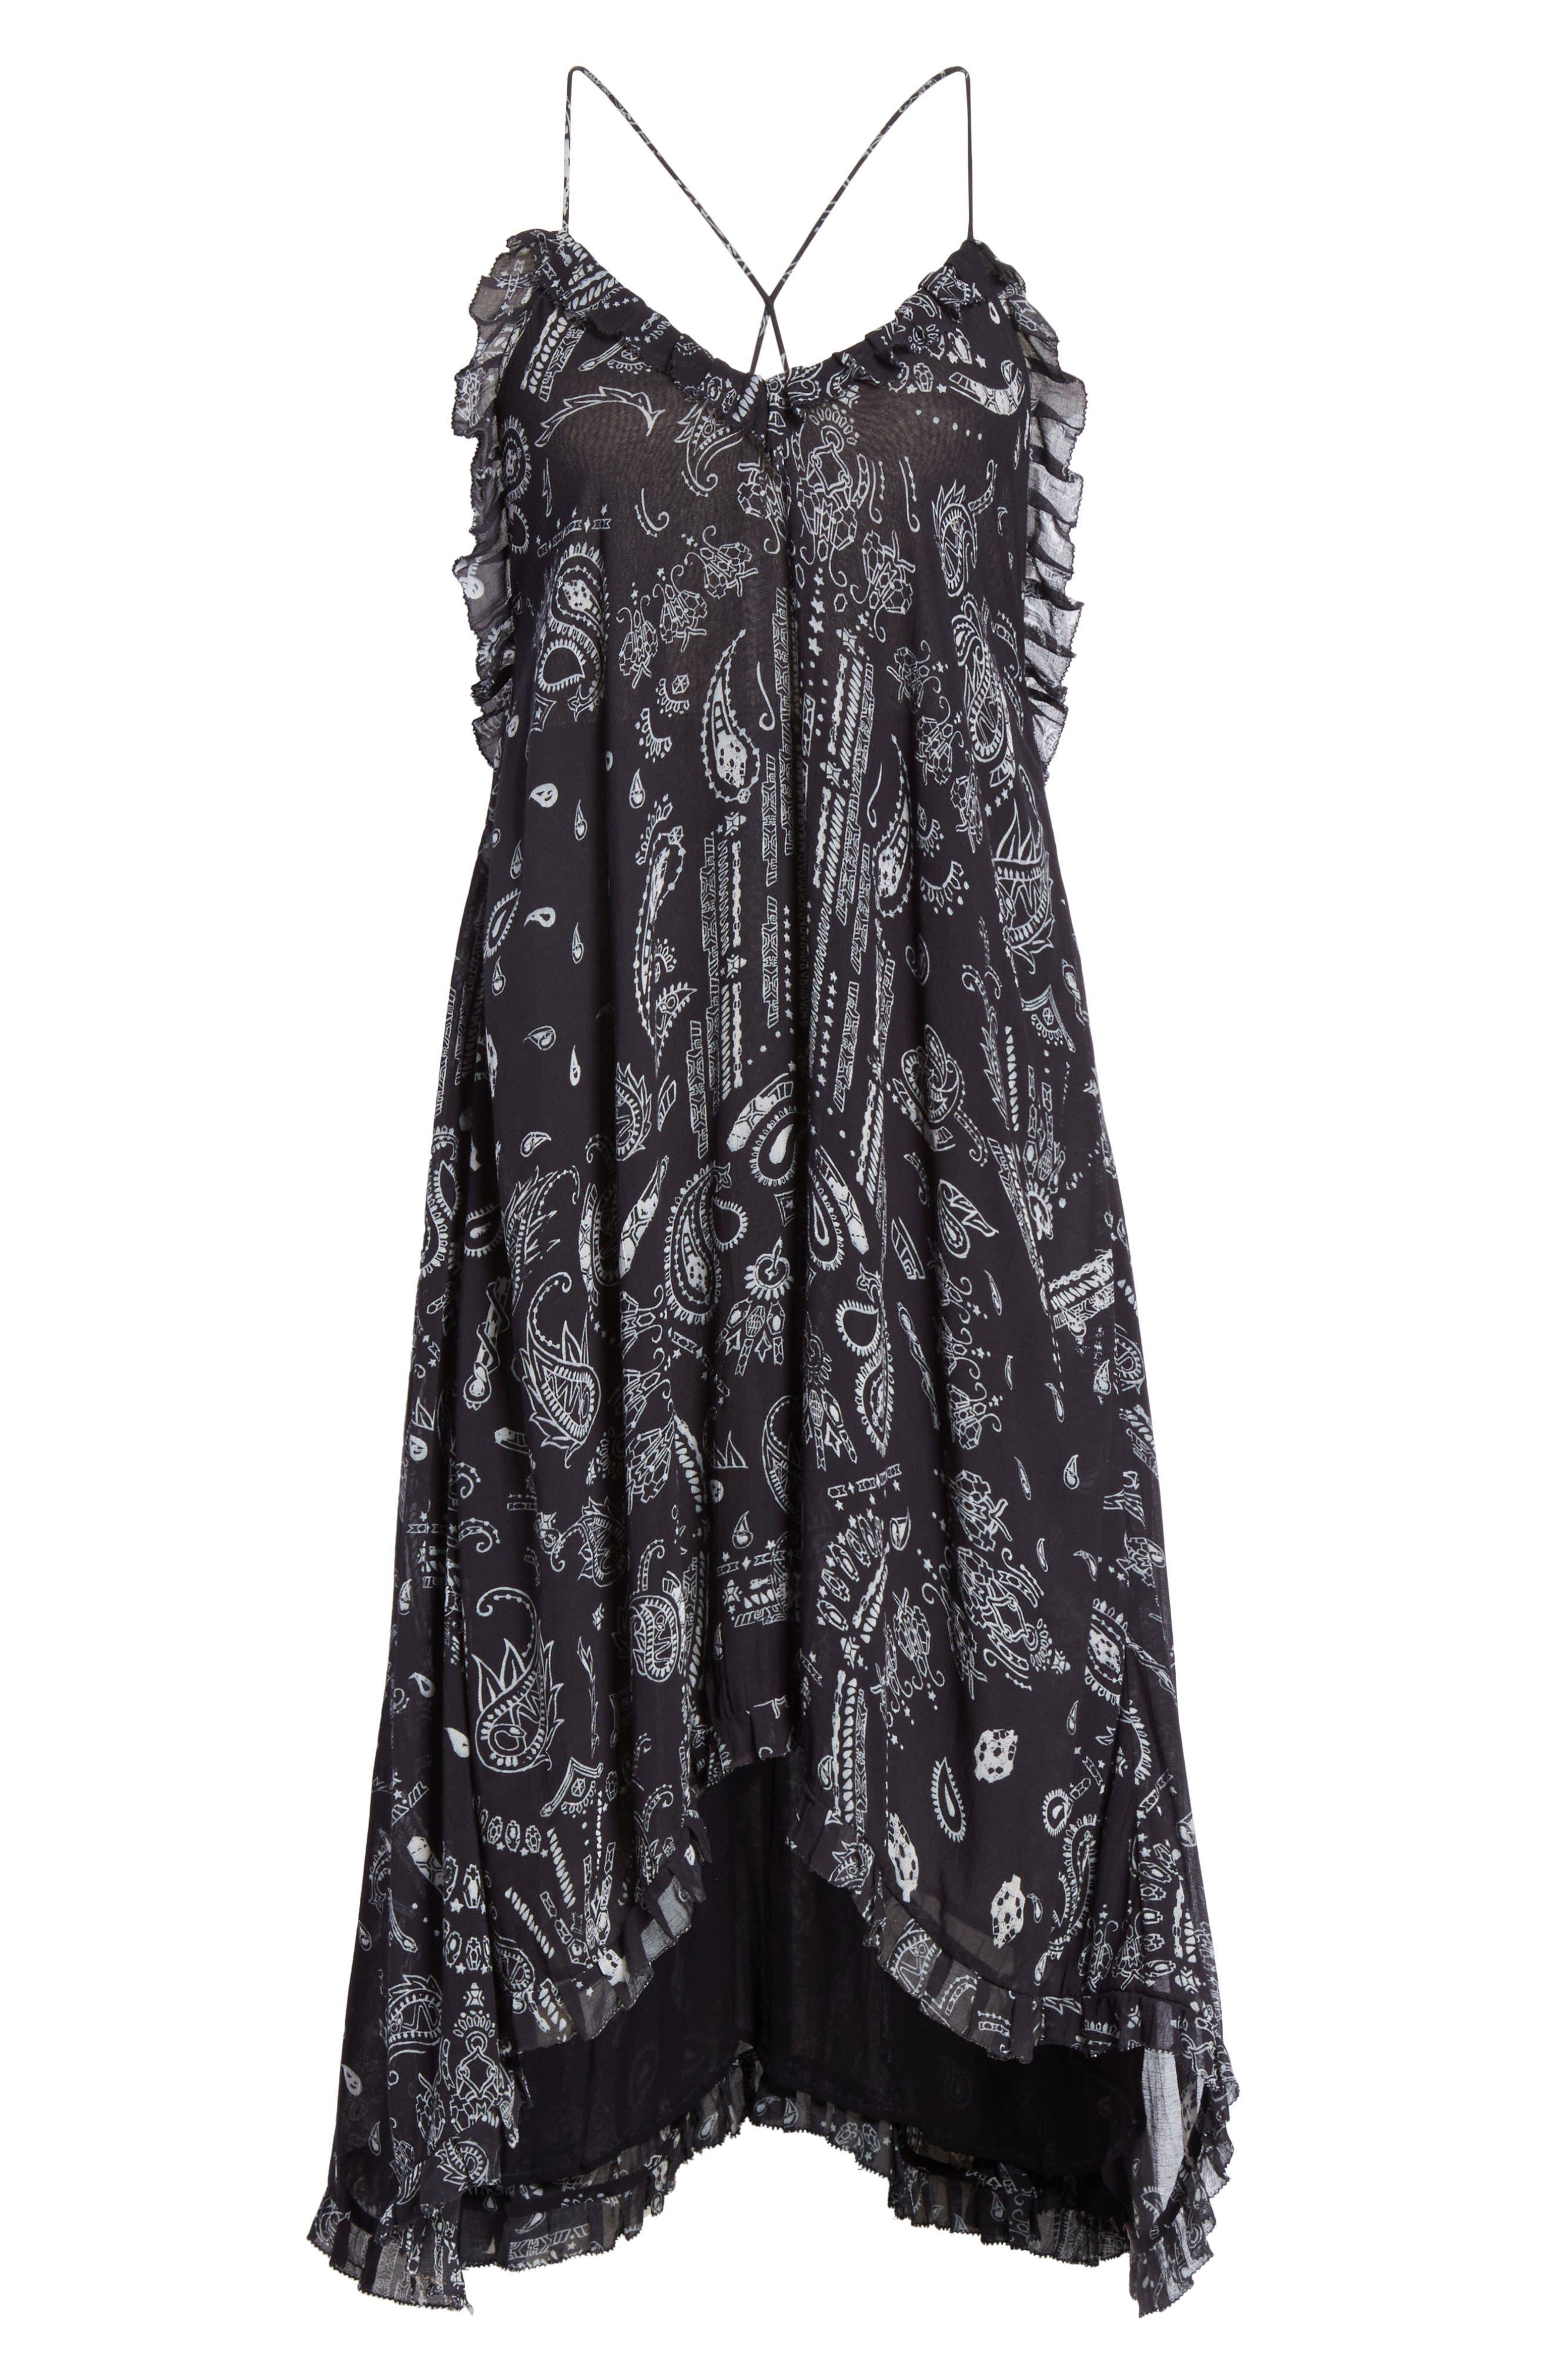 Bagda Bandana Print Ruffle Trim Dress,                             Alternate thumbnail 6, color,                             Black